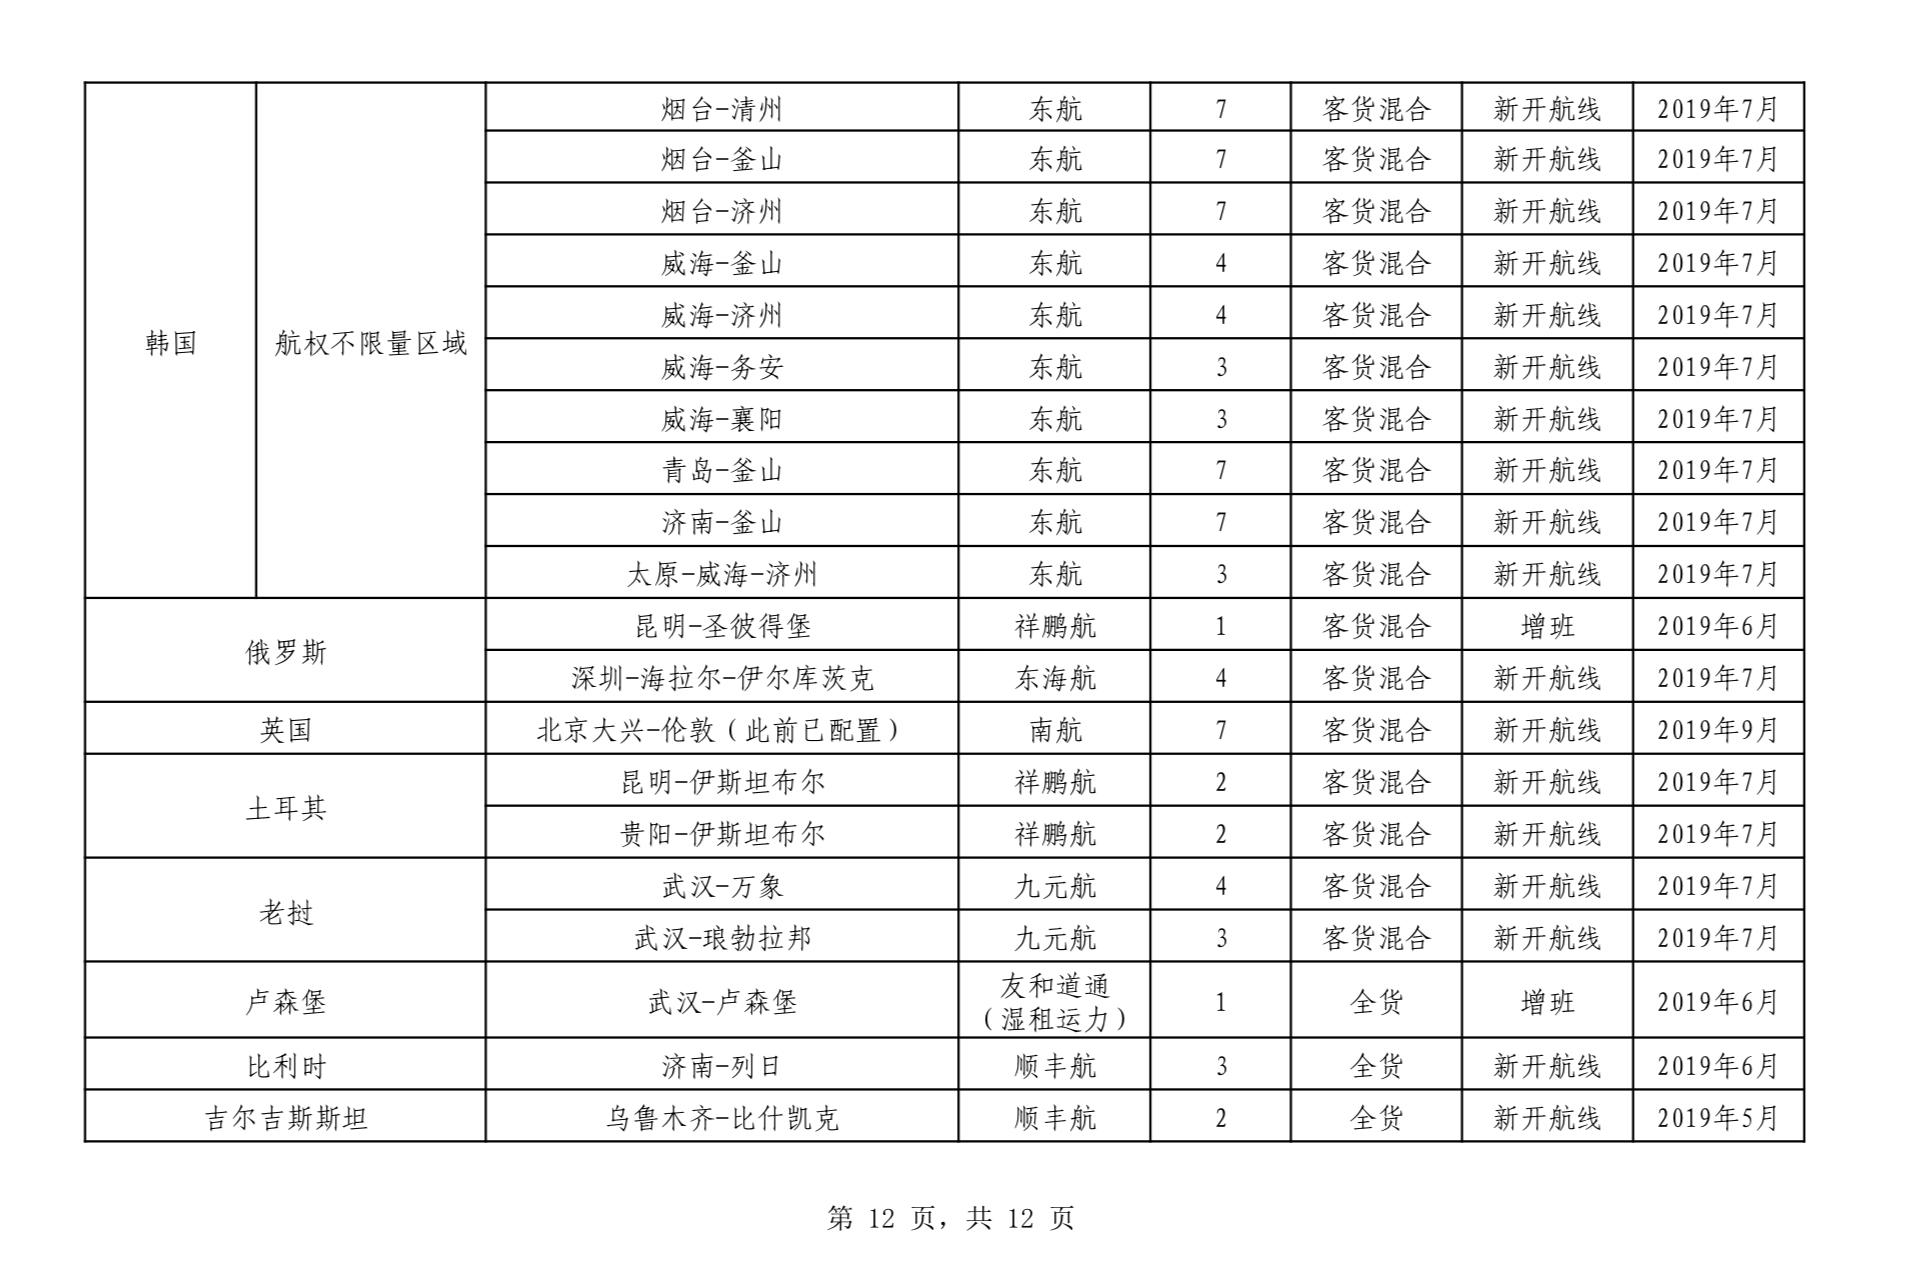 CB166288-5EAC-4B00-856F-EA2A9AE83928.jpeg